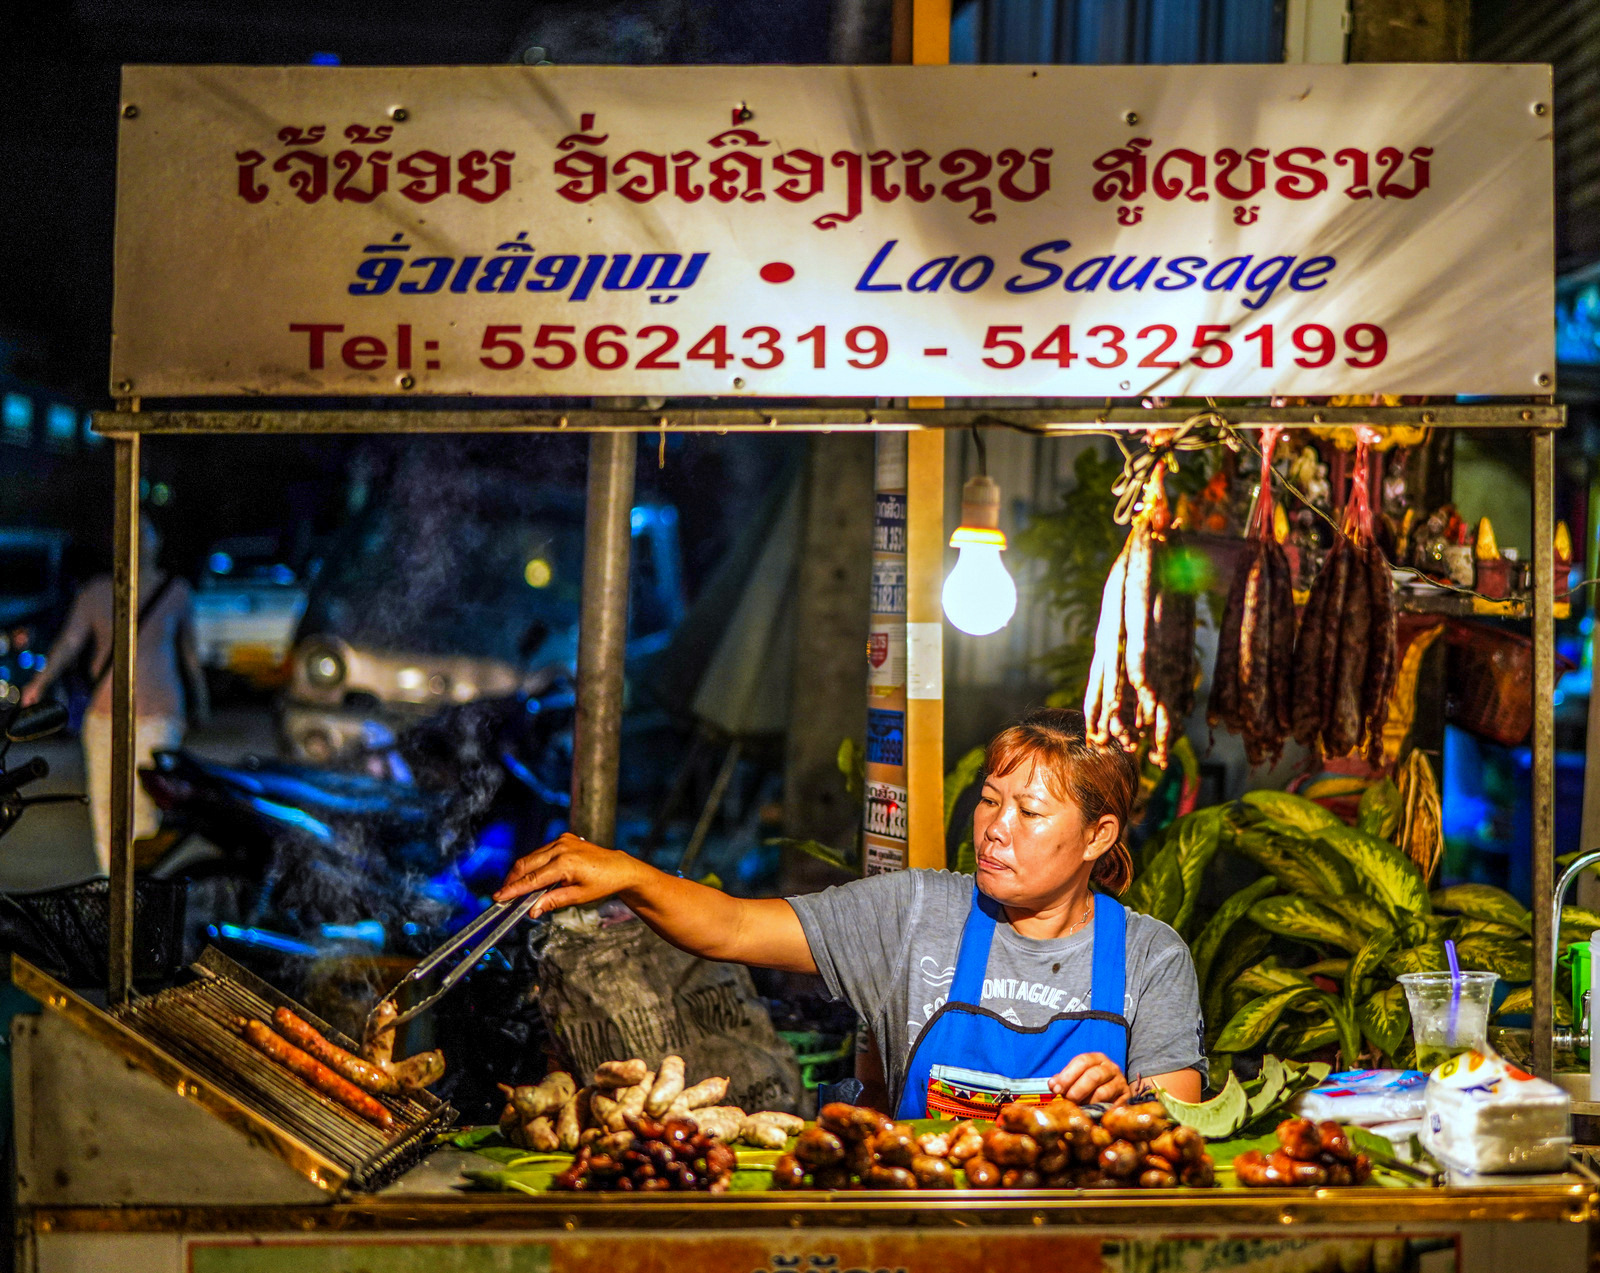 vientiane street food, laos